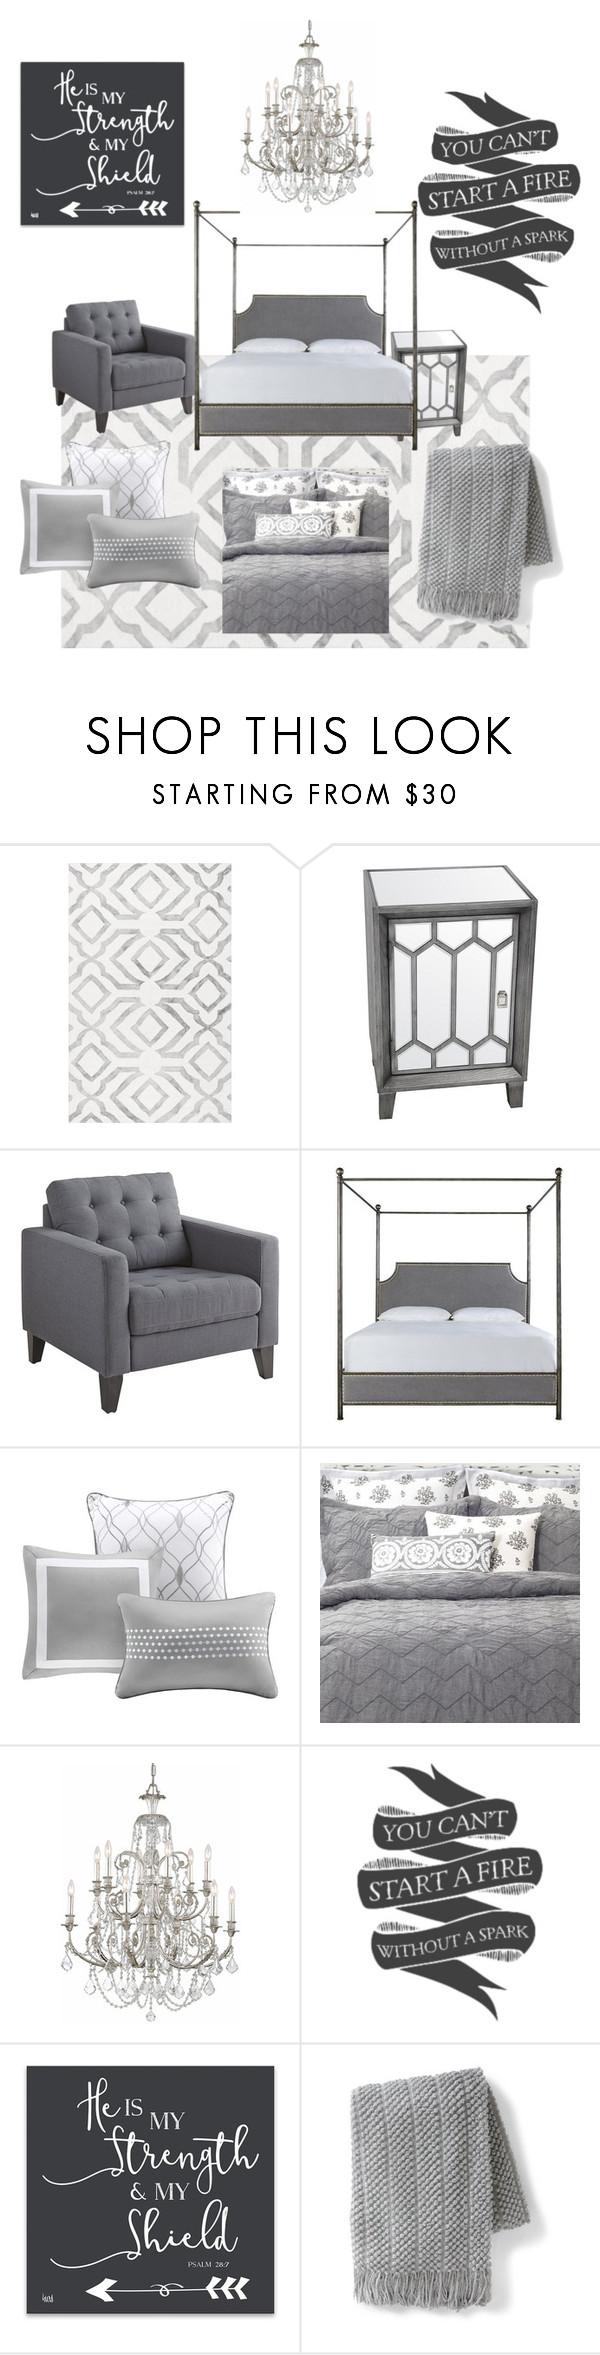 Gray scale bedroom | Home decor, Bedroom, Interior design